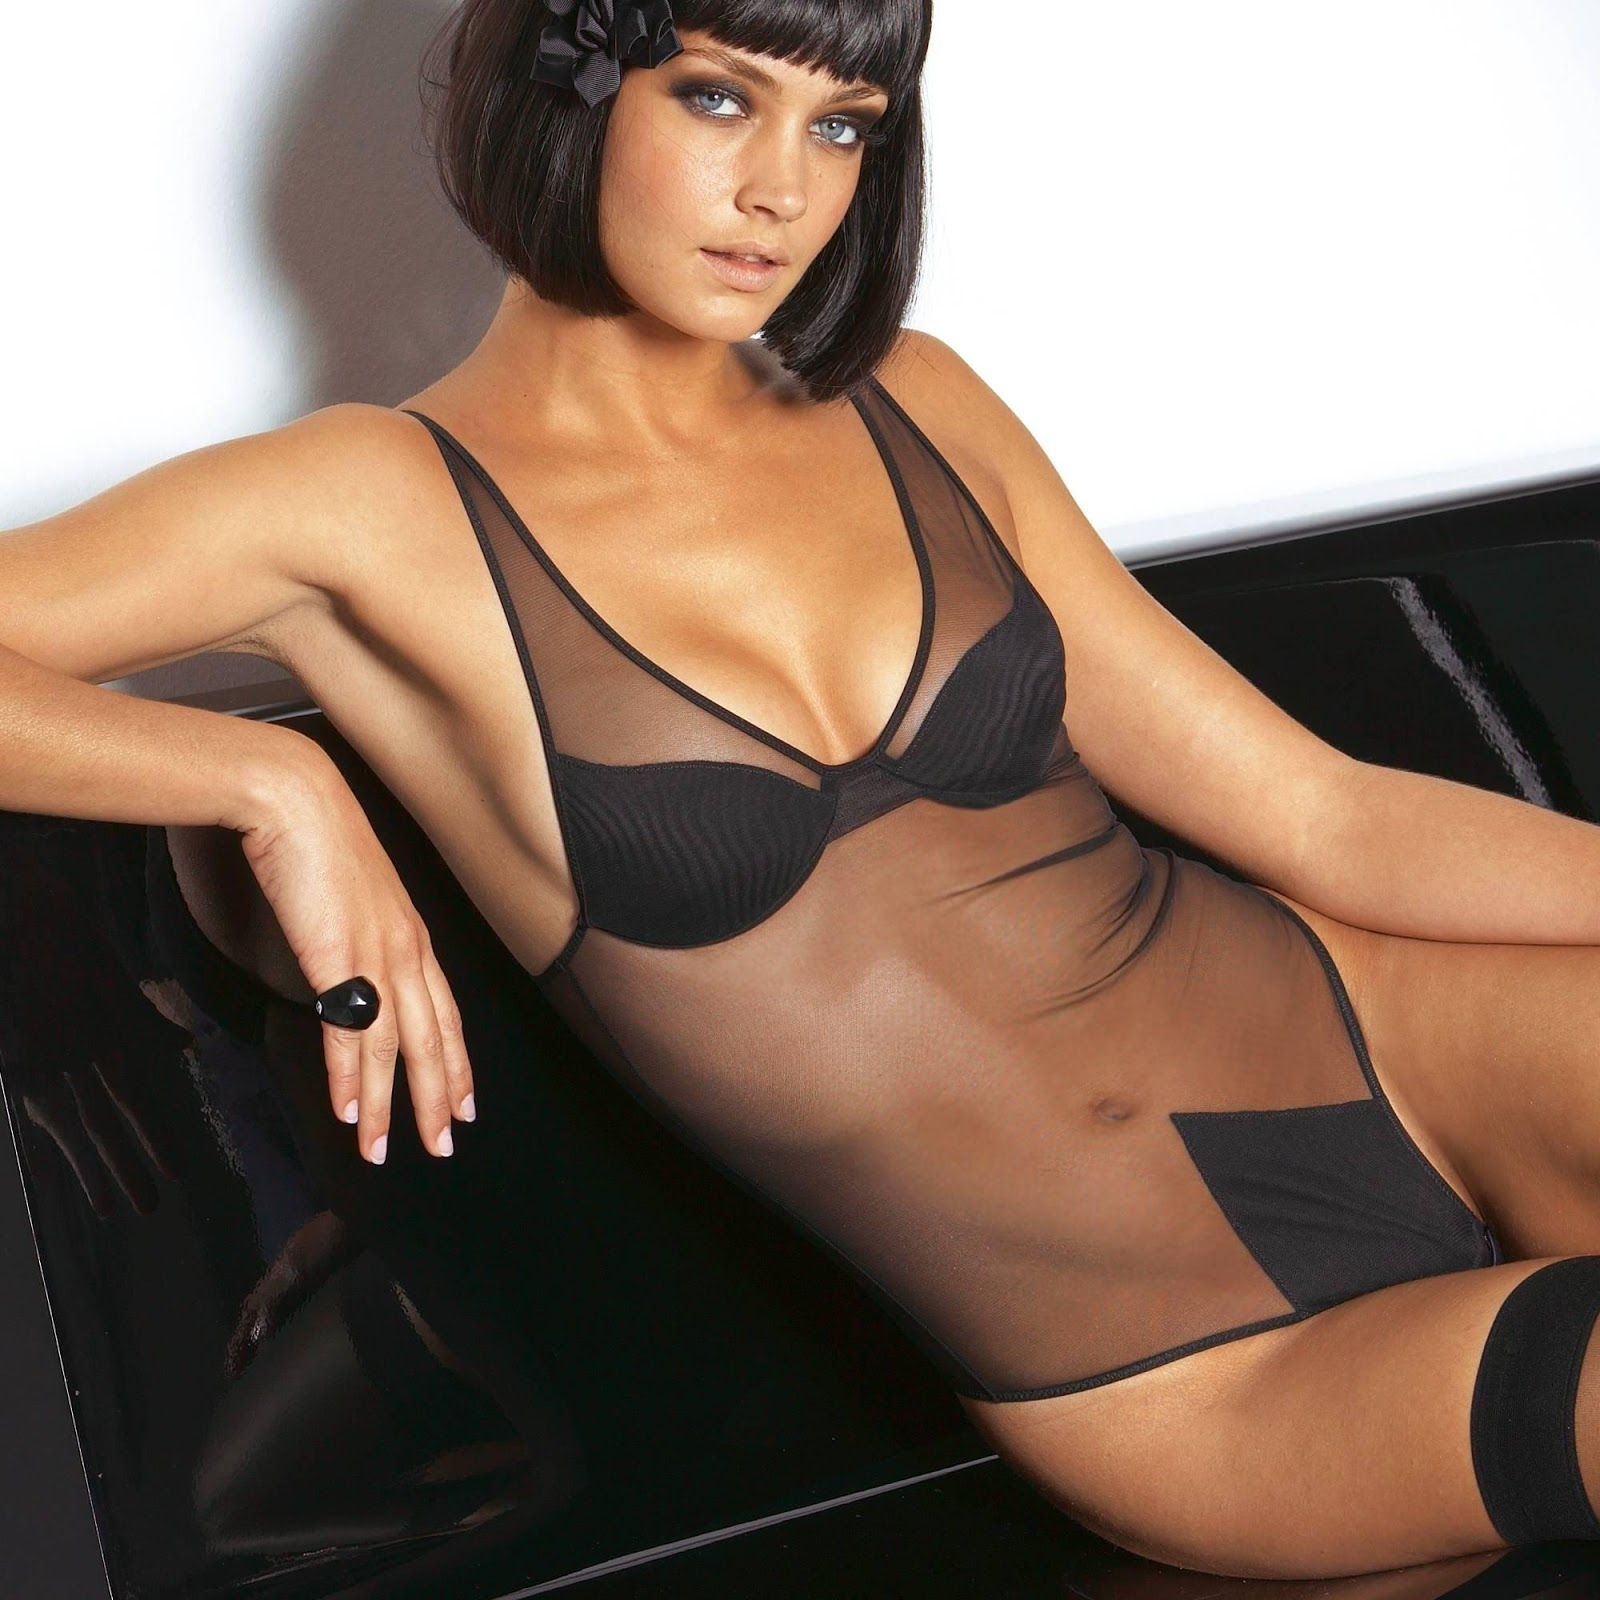 ganesh wallpapers: Candice Boucher Hot Pics |Candice ...